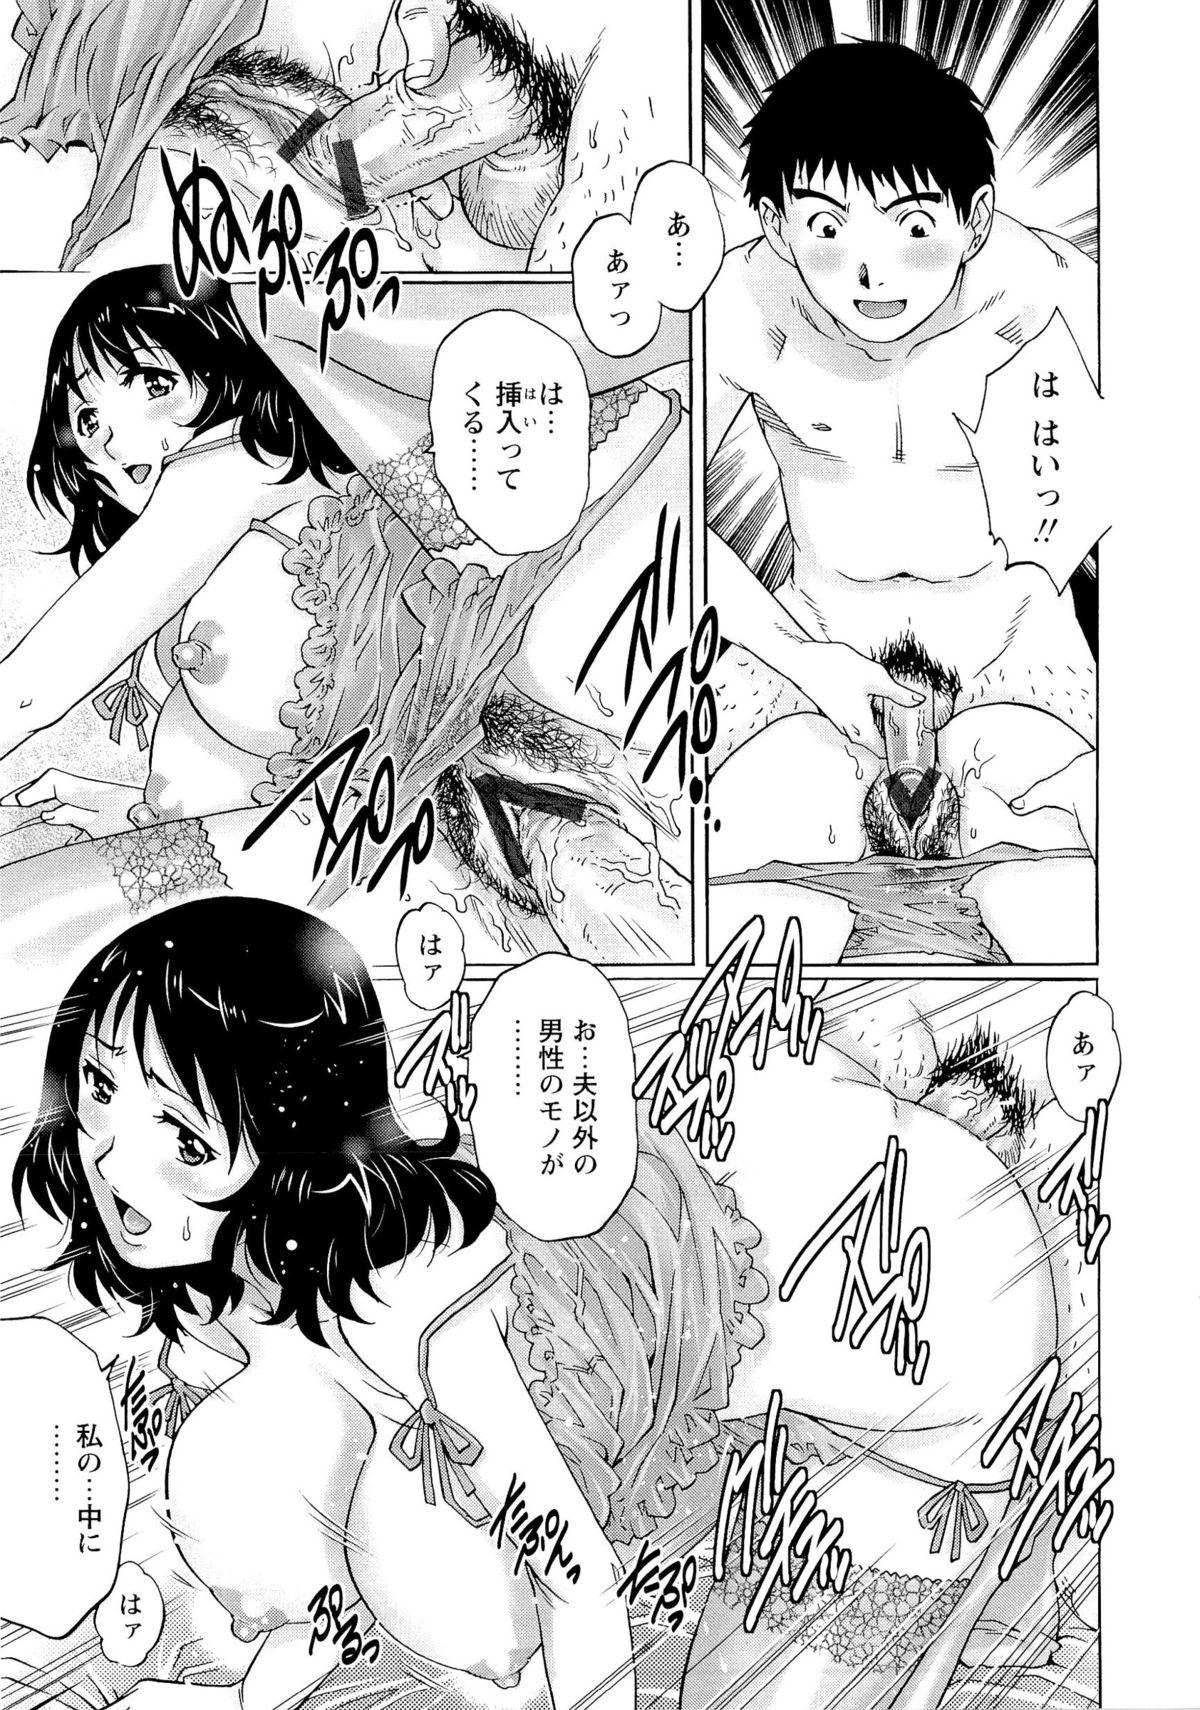 Nureteru Hitozuma - Wetly Wife 177